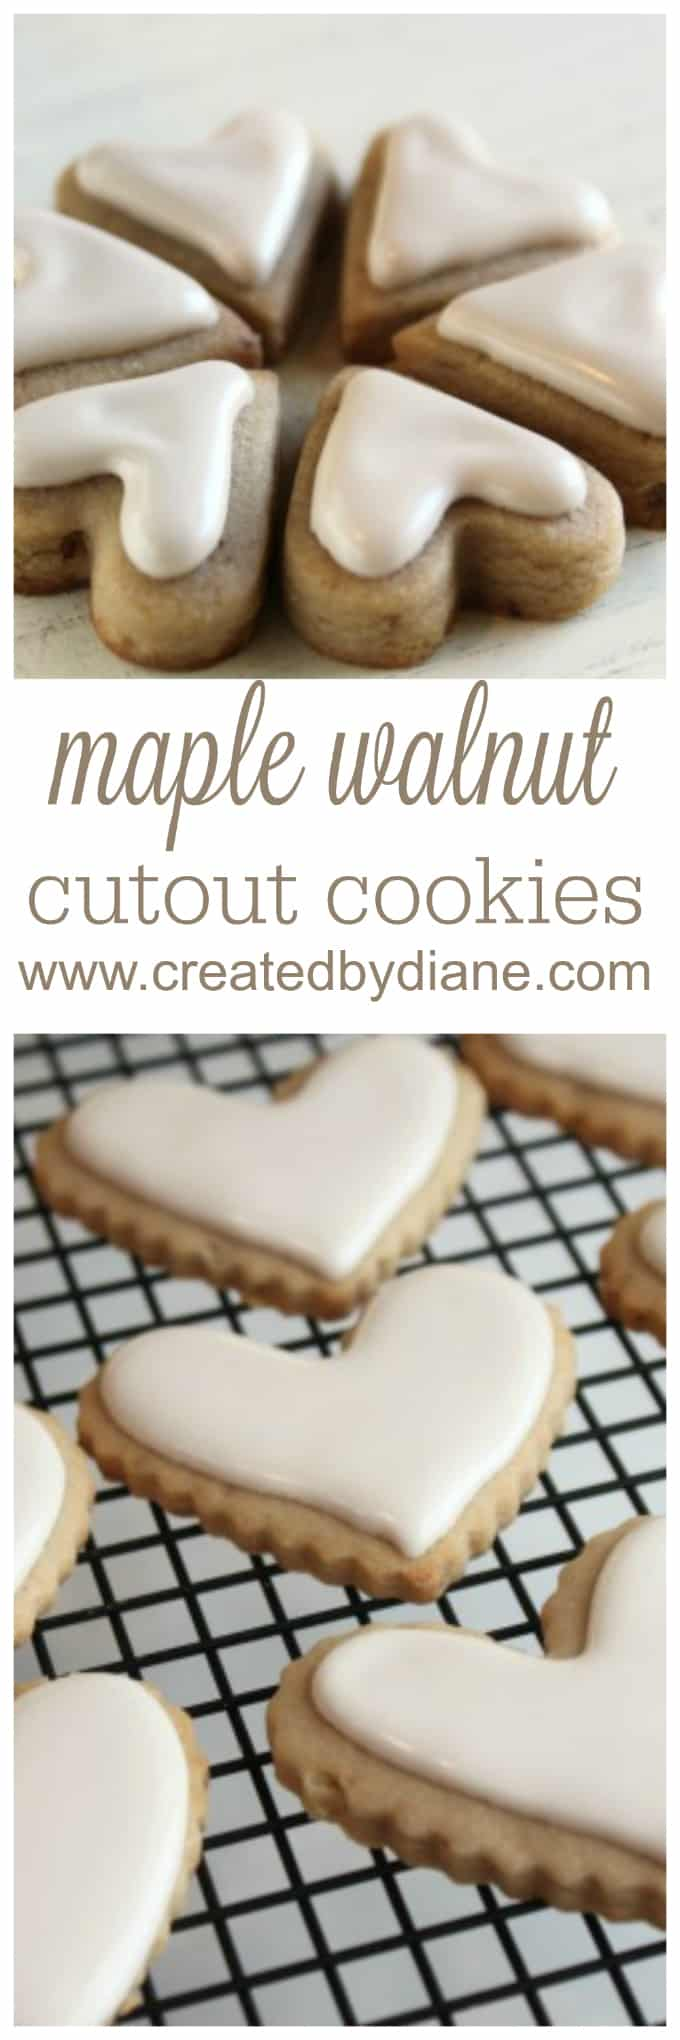 maple walnut cut out cookies www.createdbydiane.com